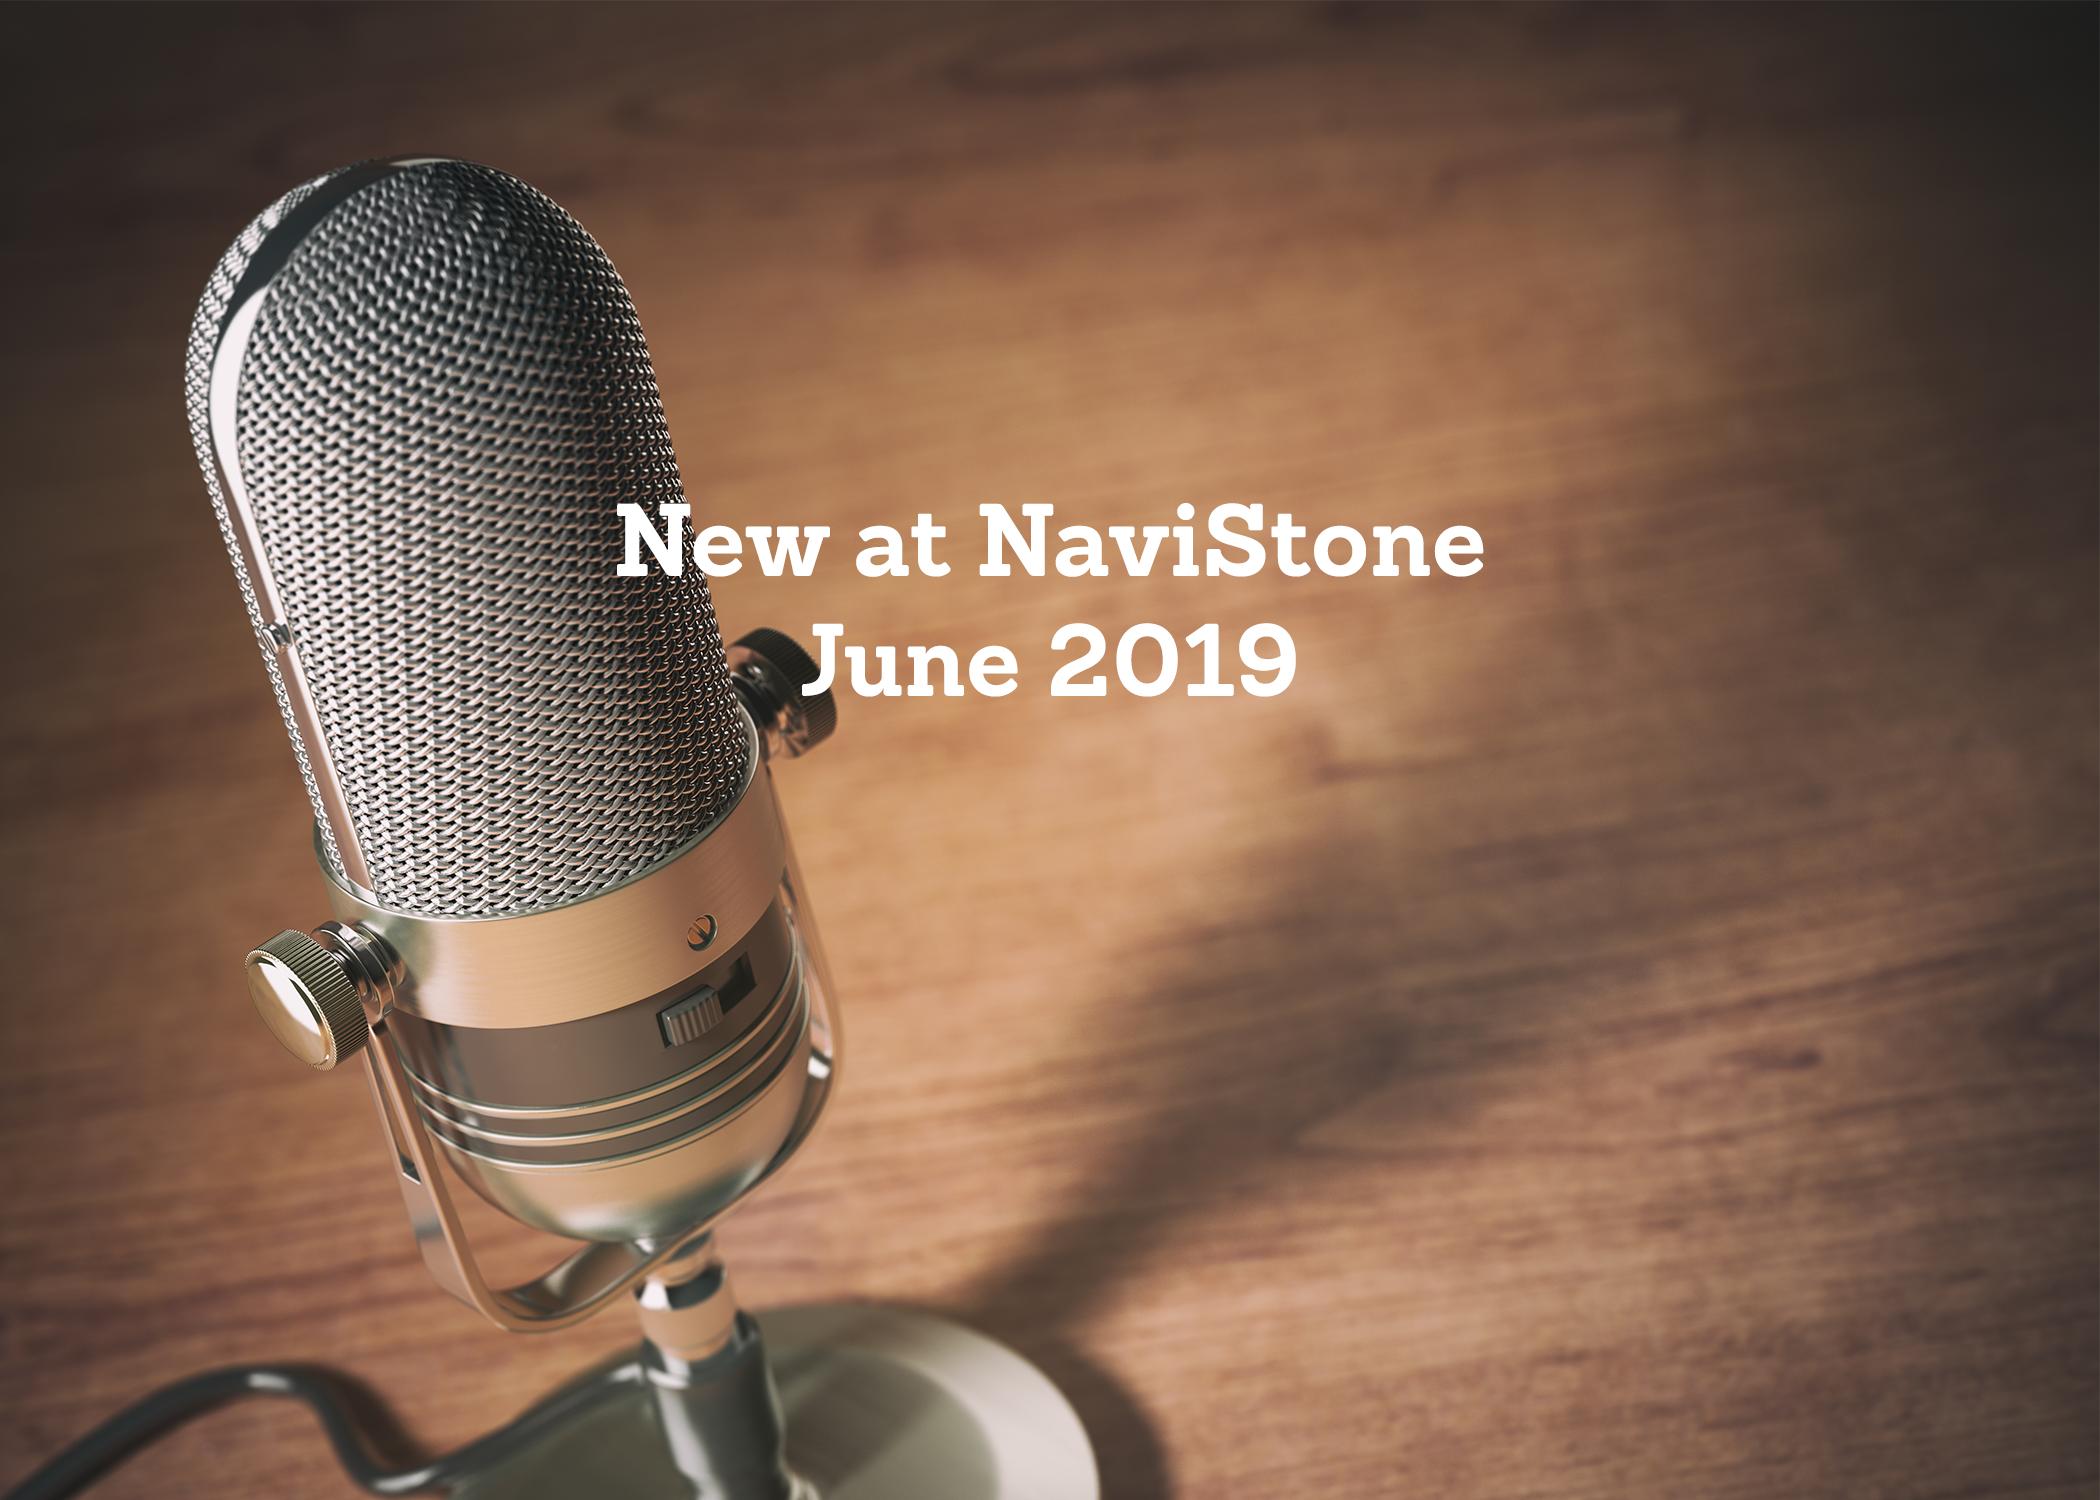 New at NaviStone June